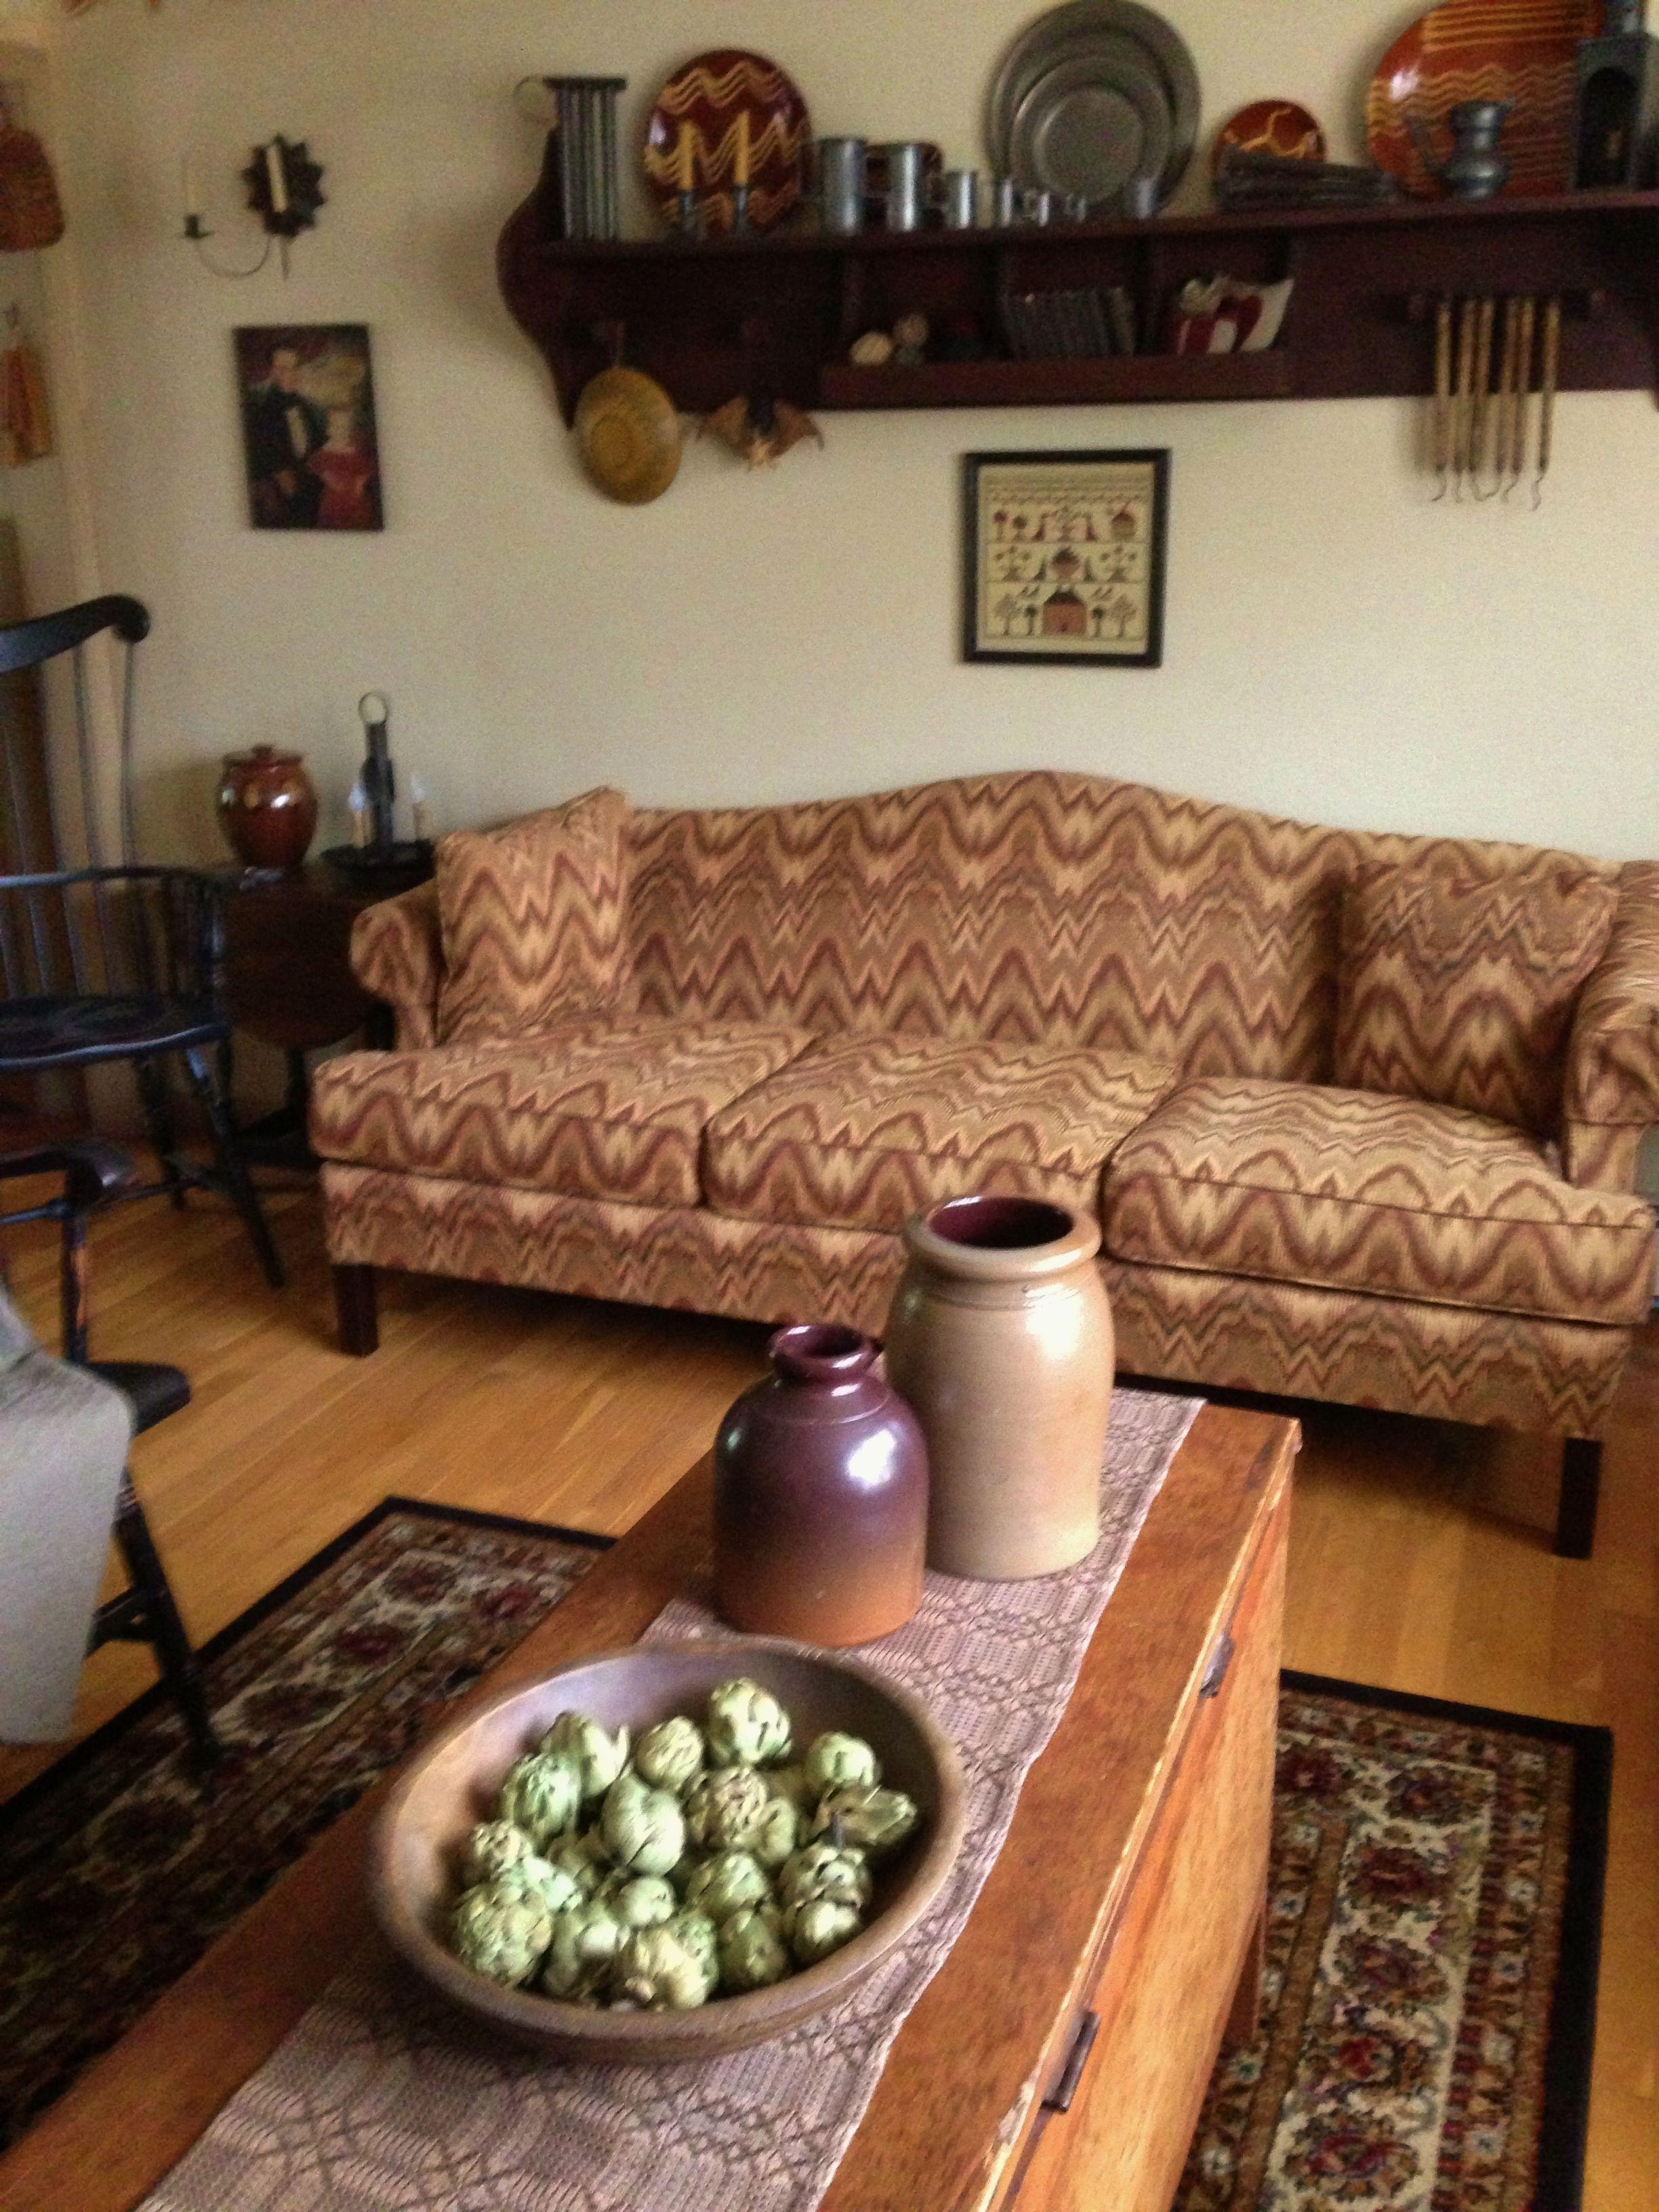 country primitive sofa tables fc copenhagen vs esbjerg sofascore nice simple look decorating pinterest